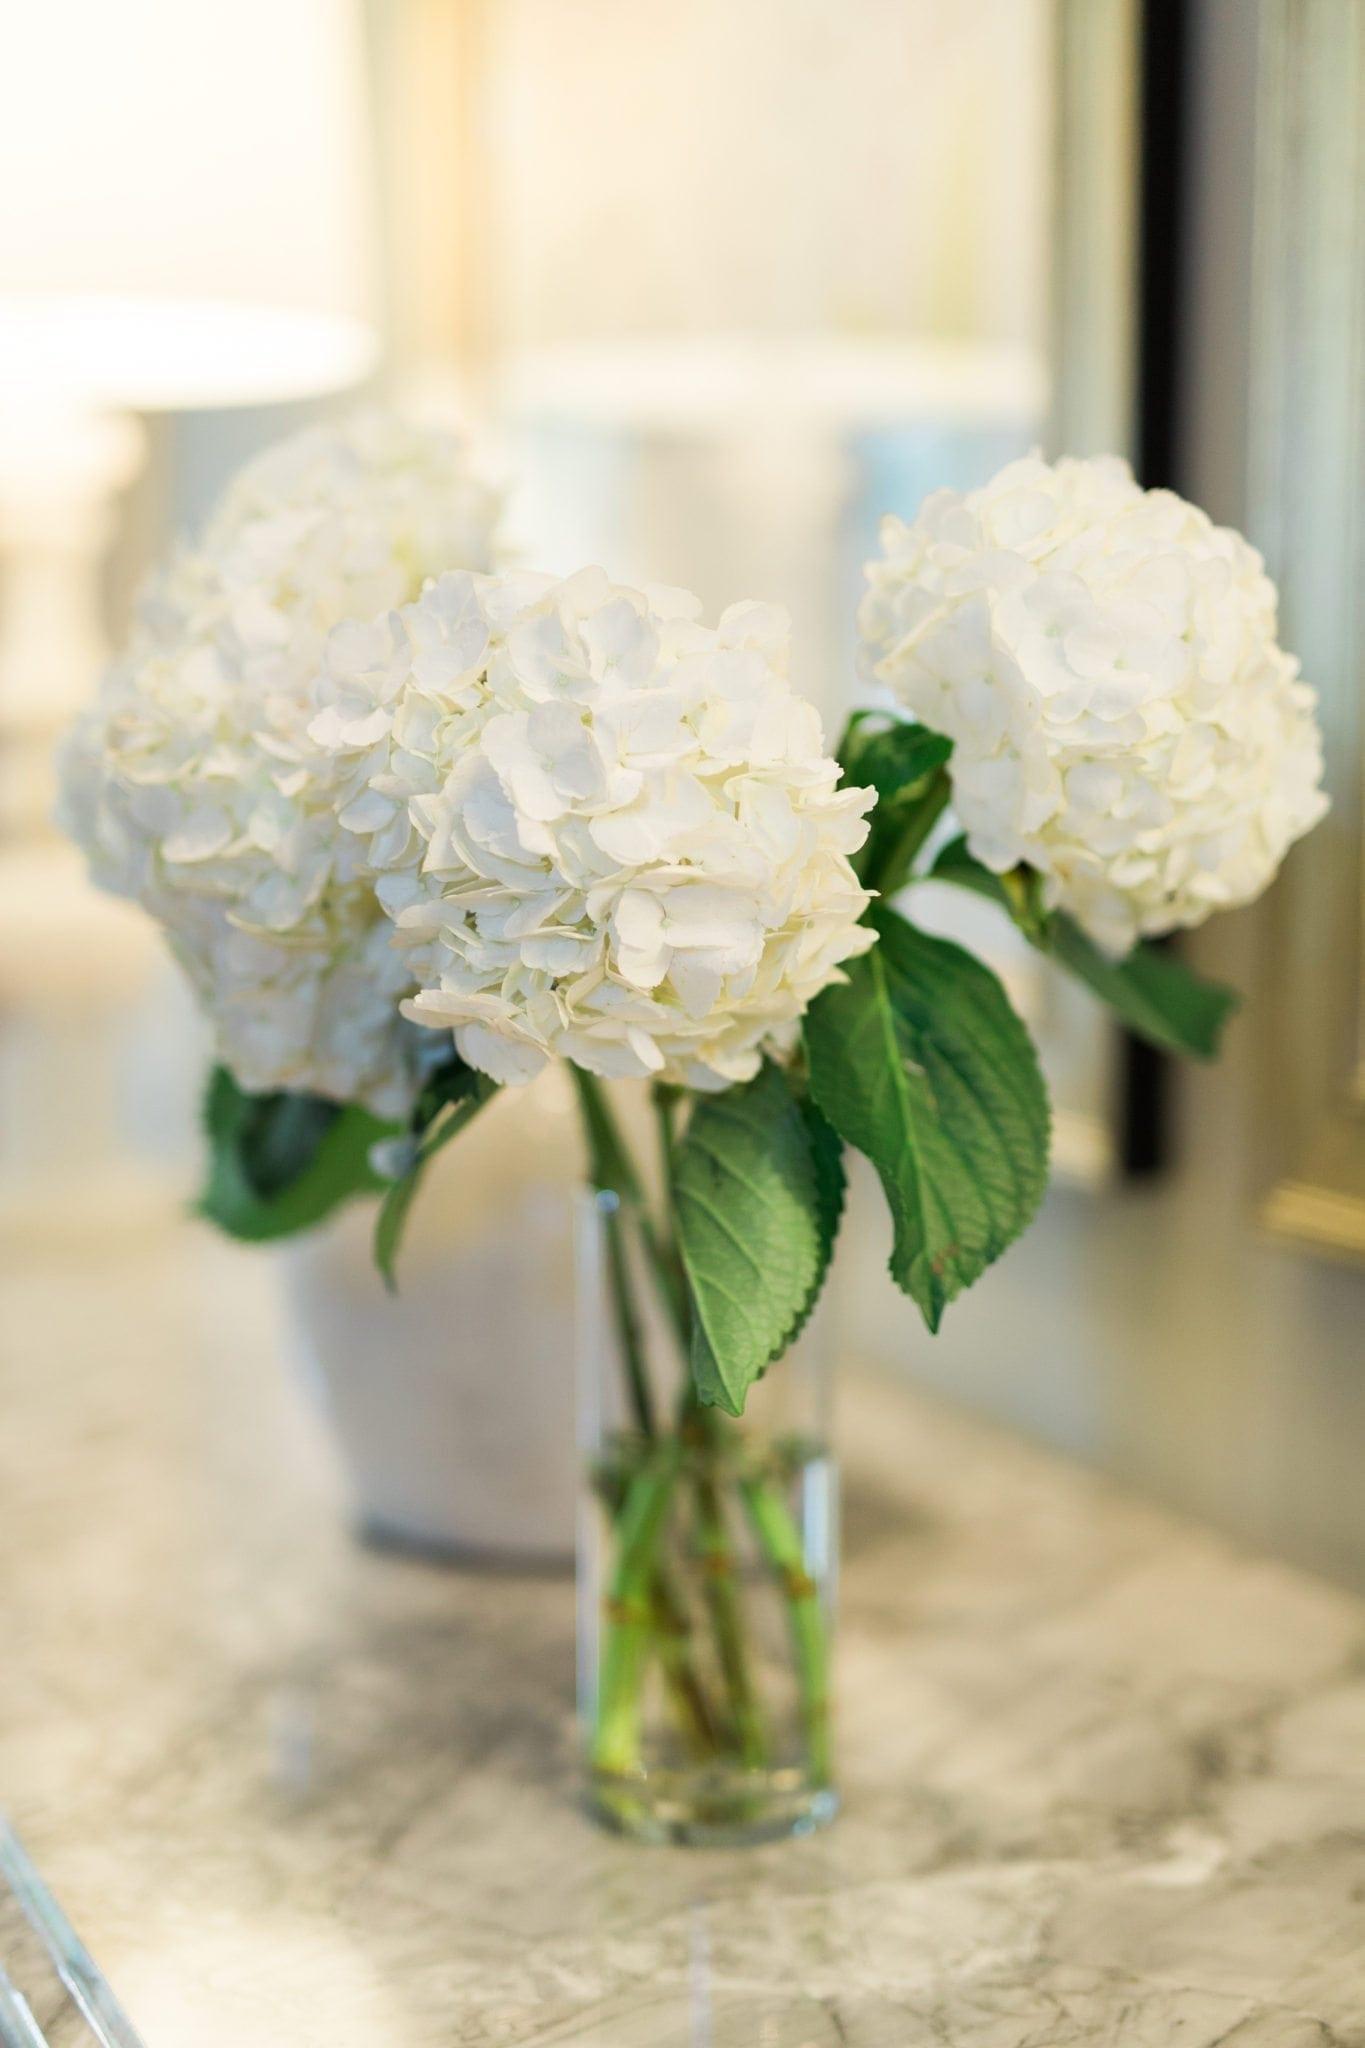 Easy tips to keep your hydrangeas alive longer.